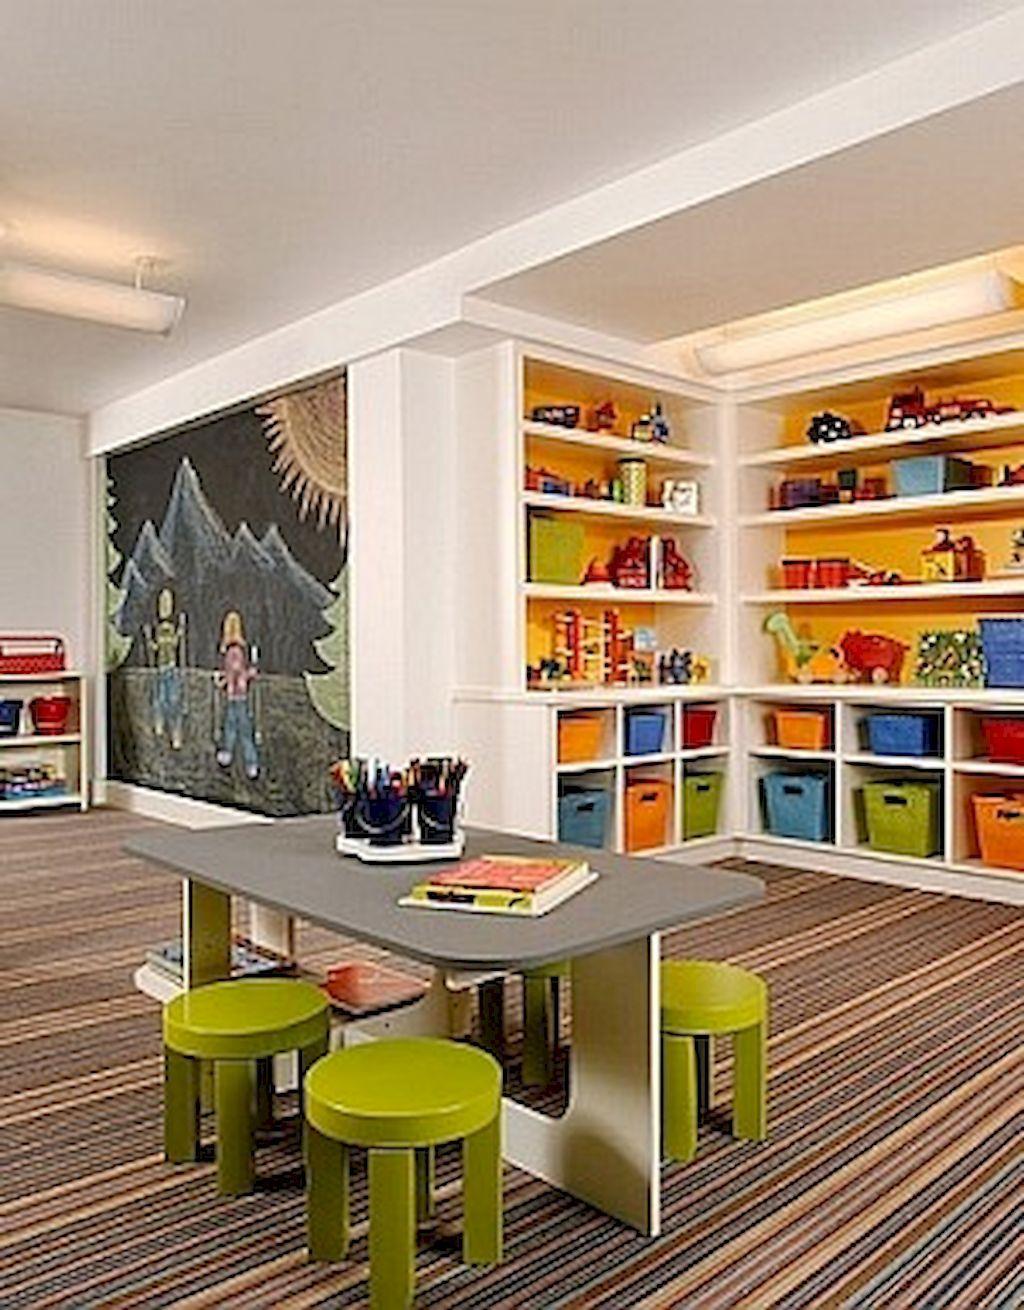 80 Basement Playroom Decorating Ideas Decorapartment Kids Basement Kids Playroom Basement Kids Playroom